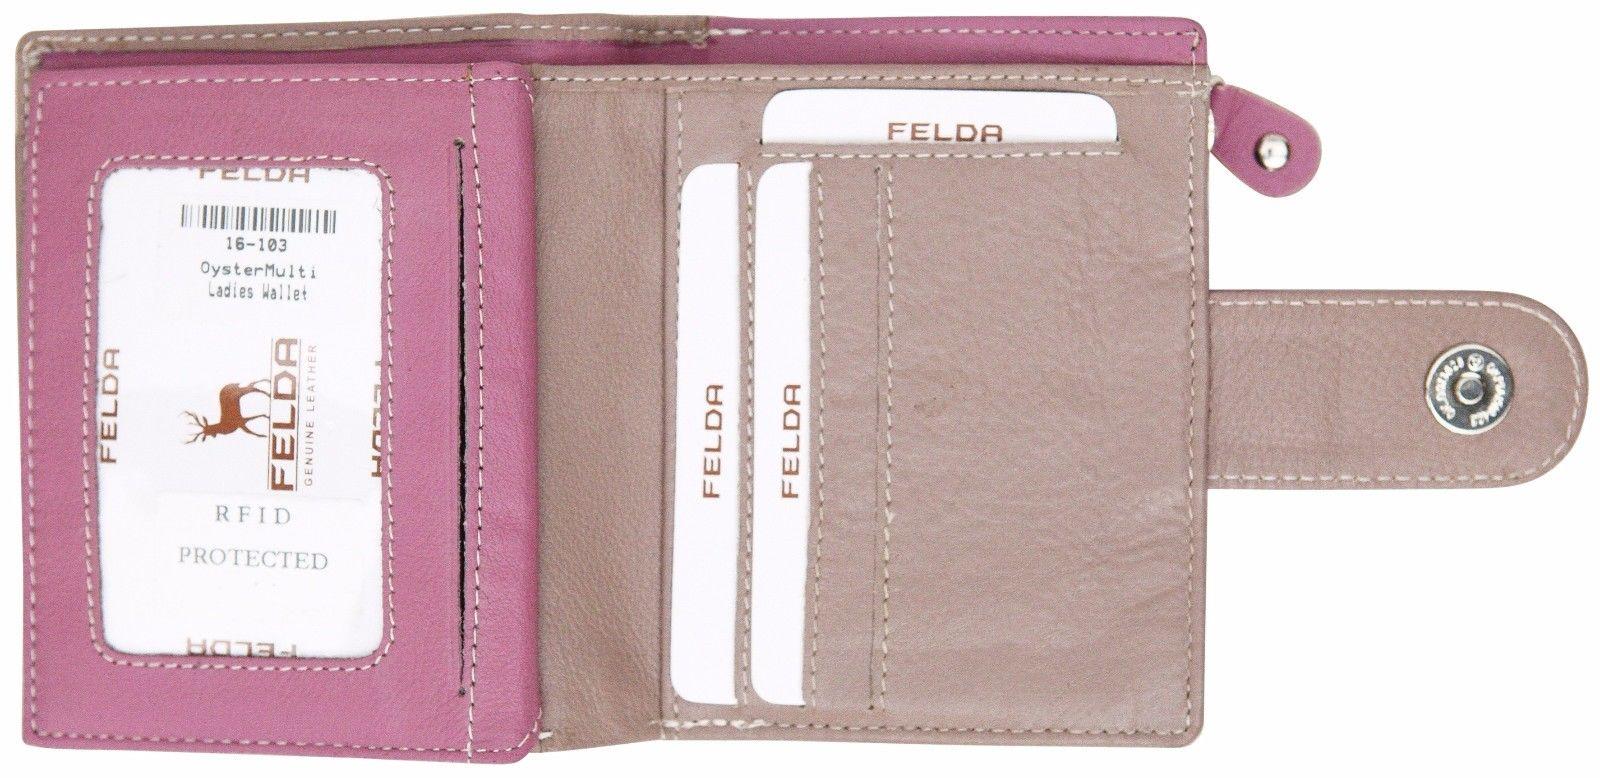 Felda-RFID-onorevoli-MEDAGLIA-amp-Card-Purse-Wallet-Genuine-Leather-Multi-SOFT-BOX-REGALO miniatura 84